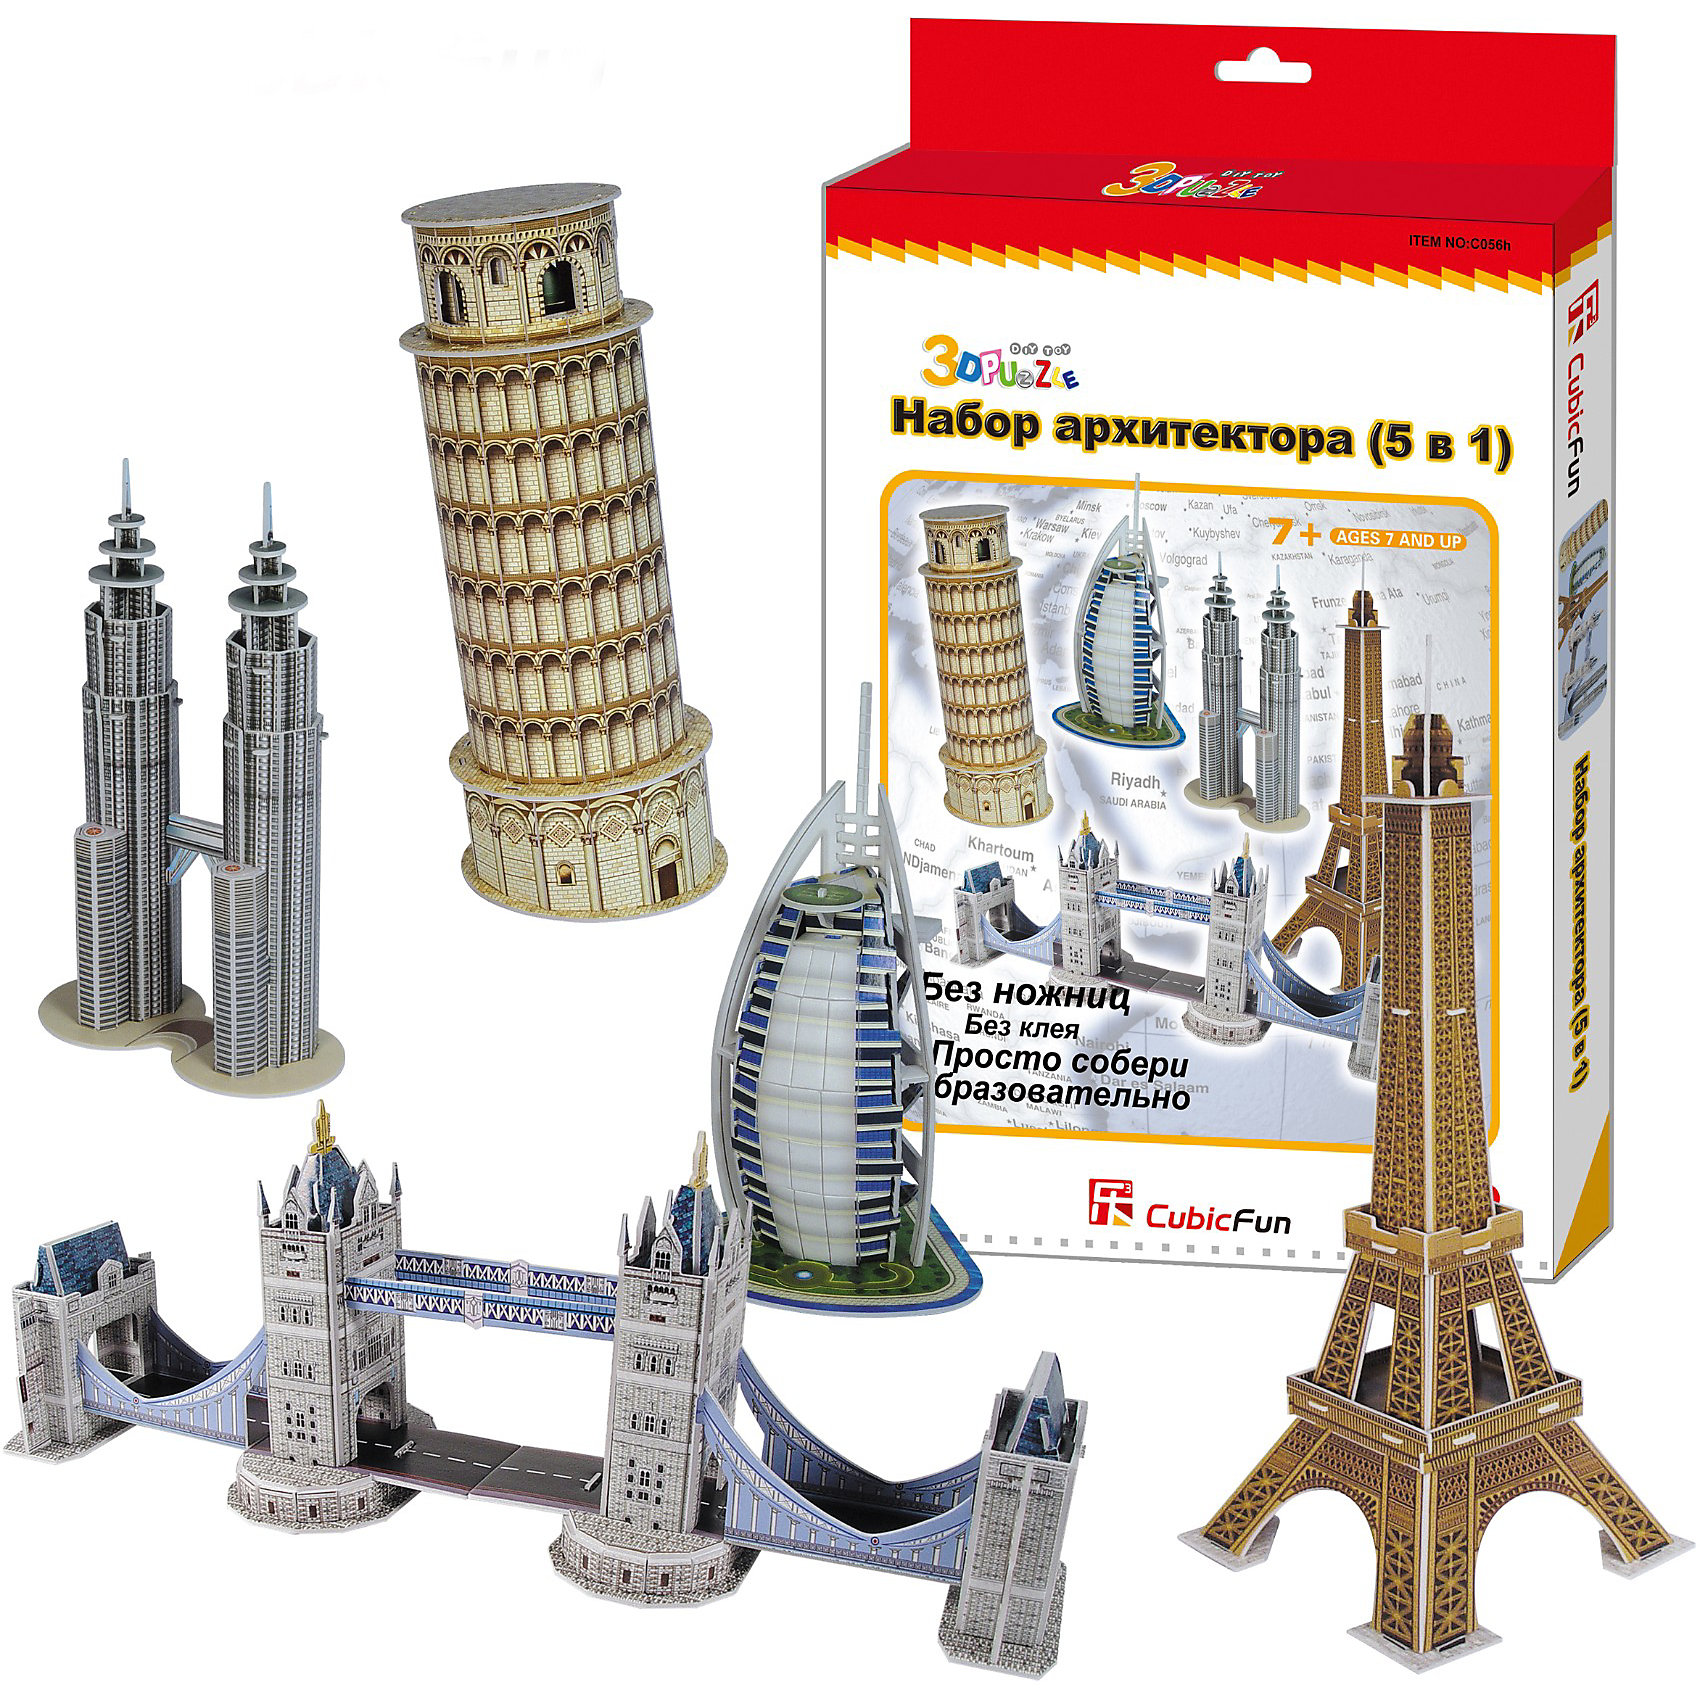 CubicFun Пазлы 3D Набор архитектора (5 в 1), CubicFun конструкторы cubicfun 3d пазл эйфелева башня 2 франция